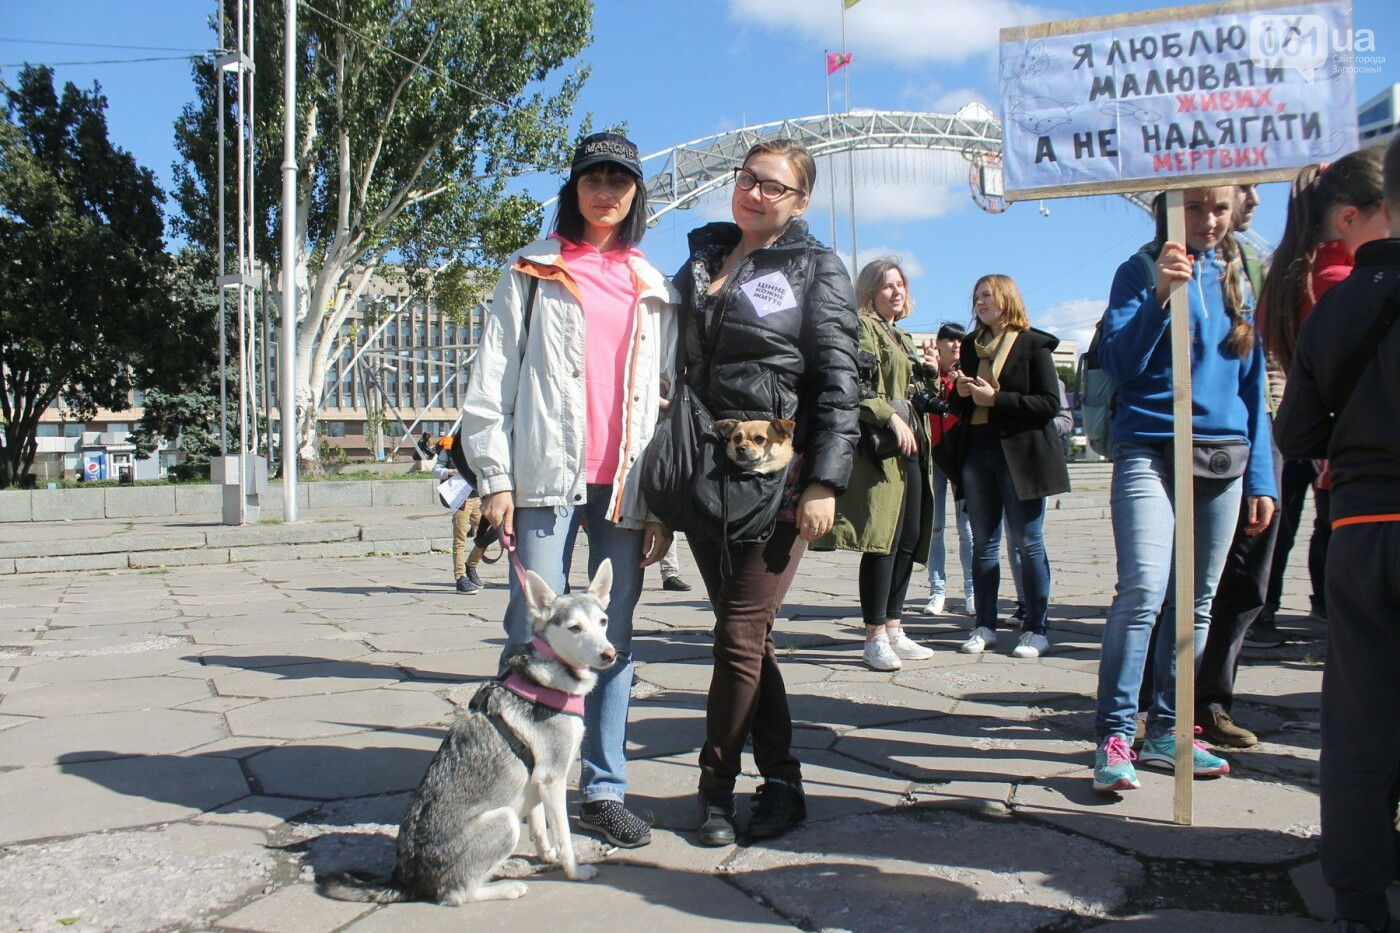 «Защити! Не мучай»: в Запорожье провели марш за права животных, – ФОТОРЕПОРТАЖ, ВИДЕО, фото-20